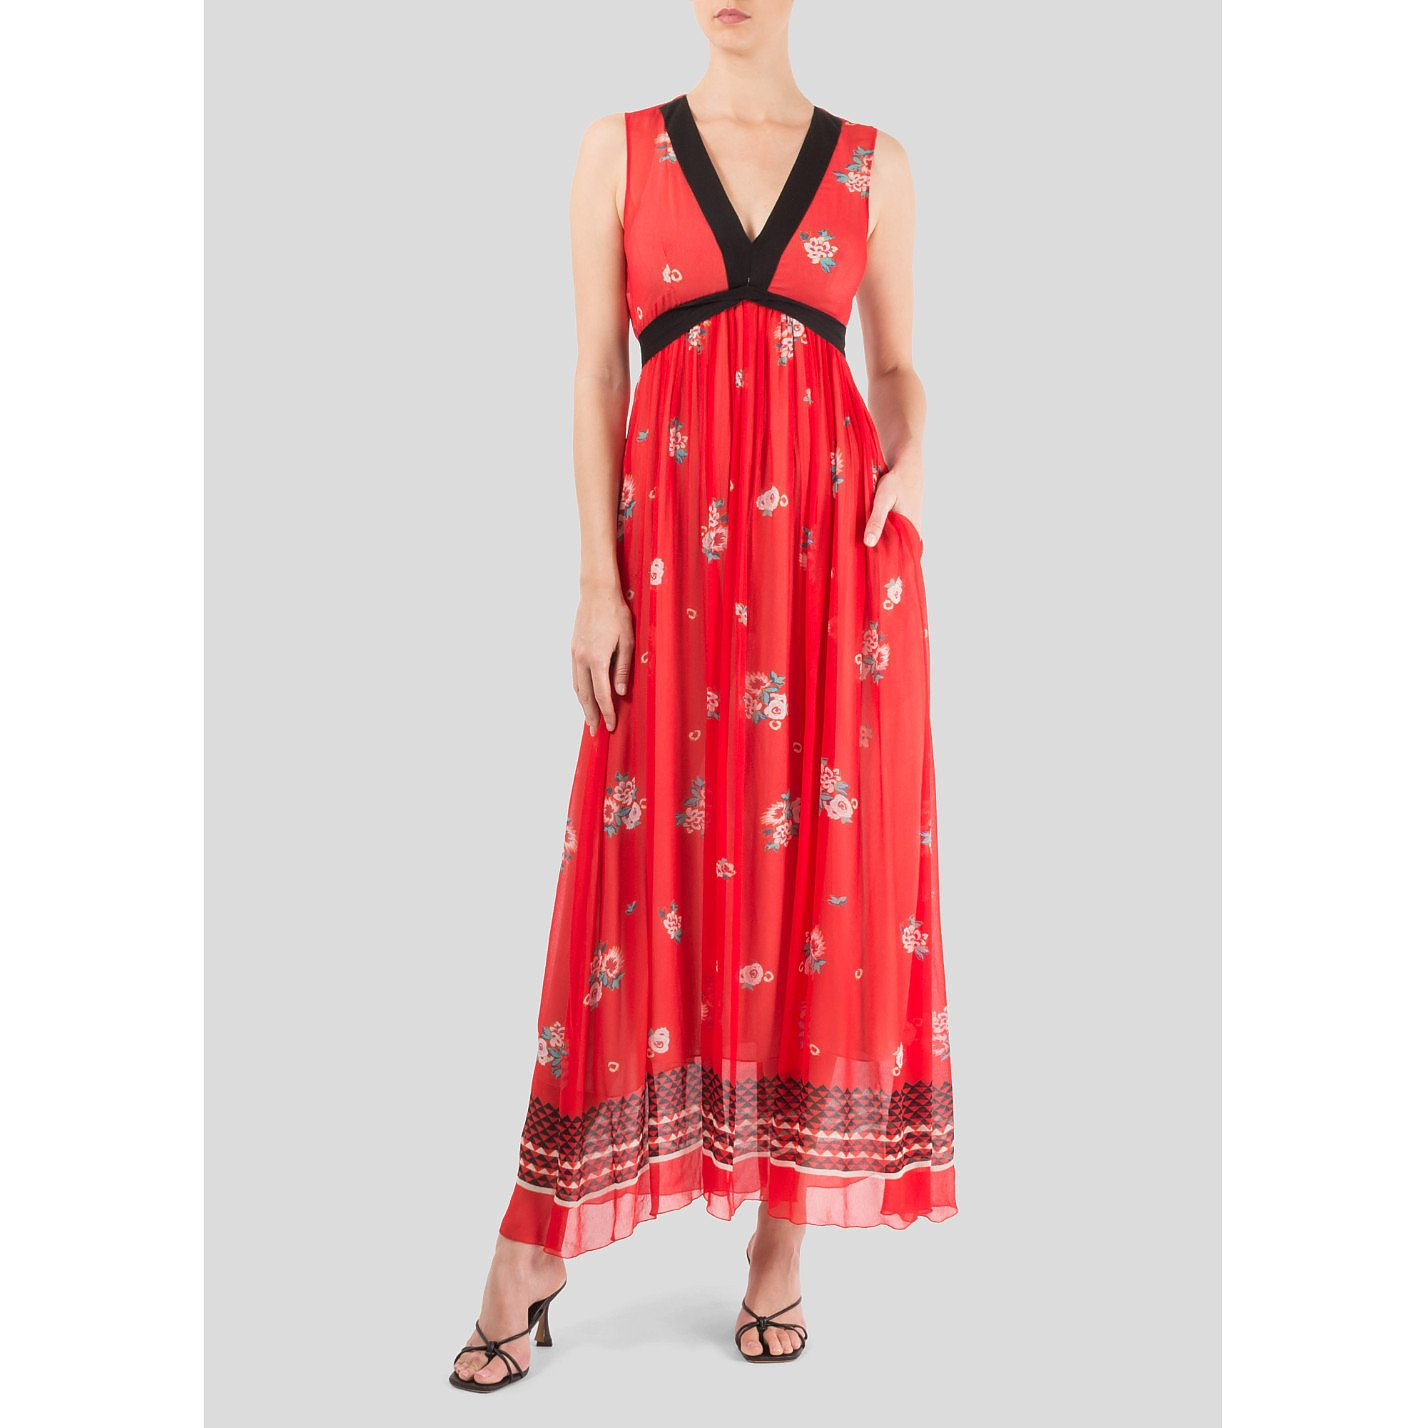 Philosophy Floral Print Maxi Dress